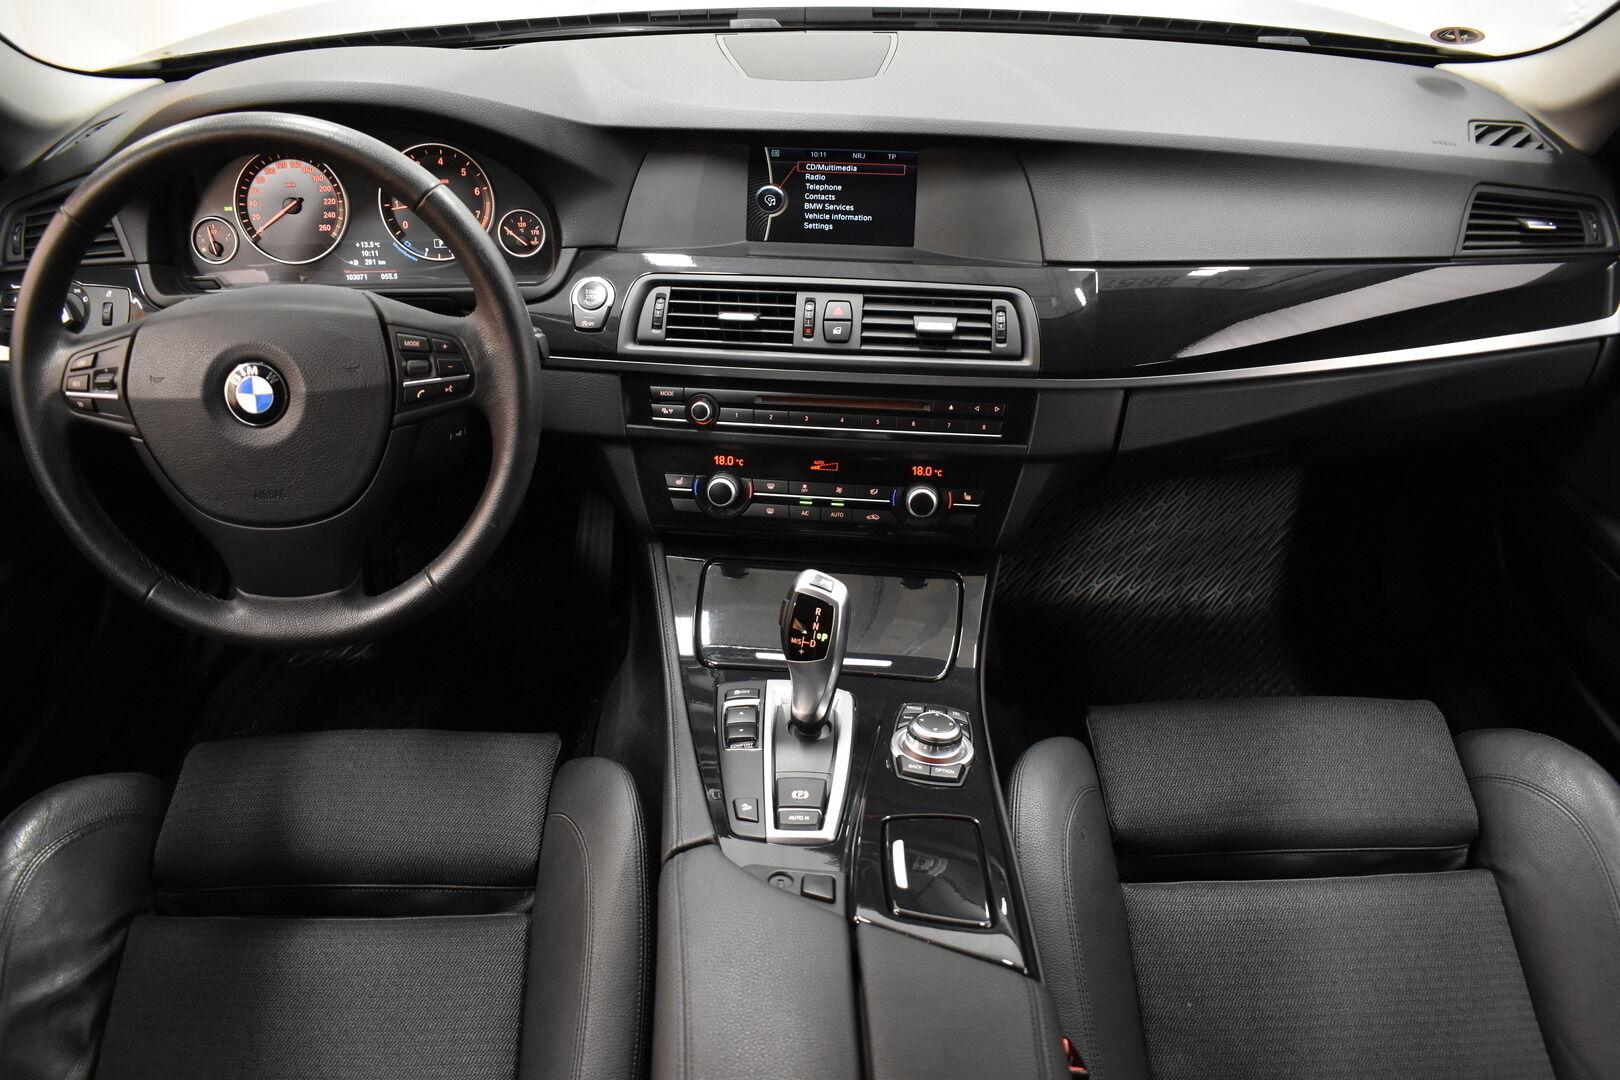 Musta Sedan, BMW 528 – POR-8128, kuva 11